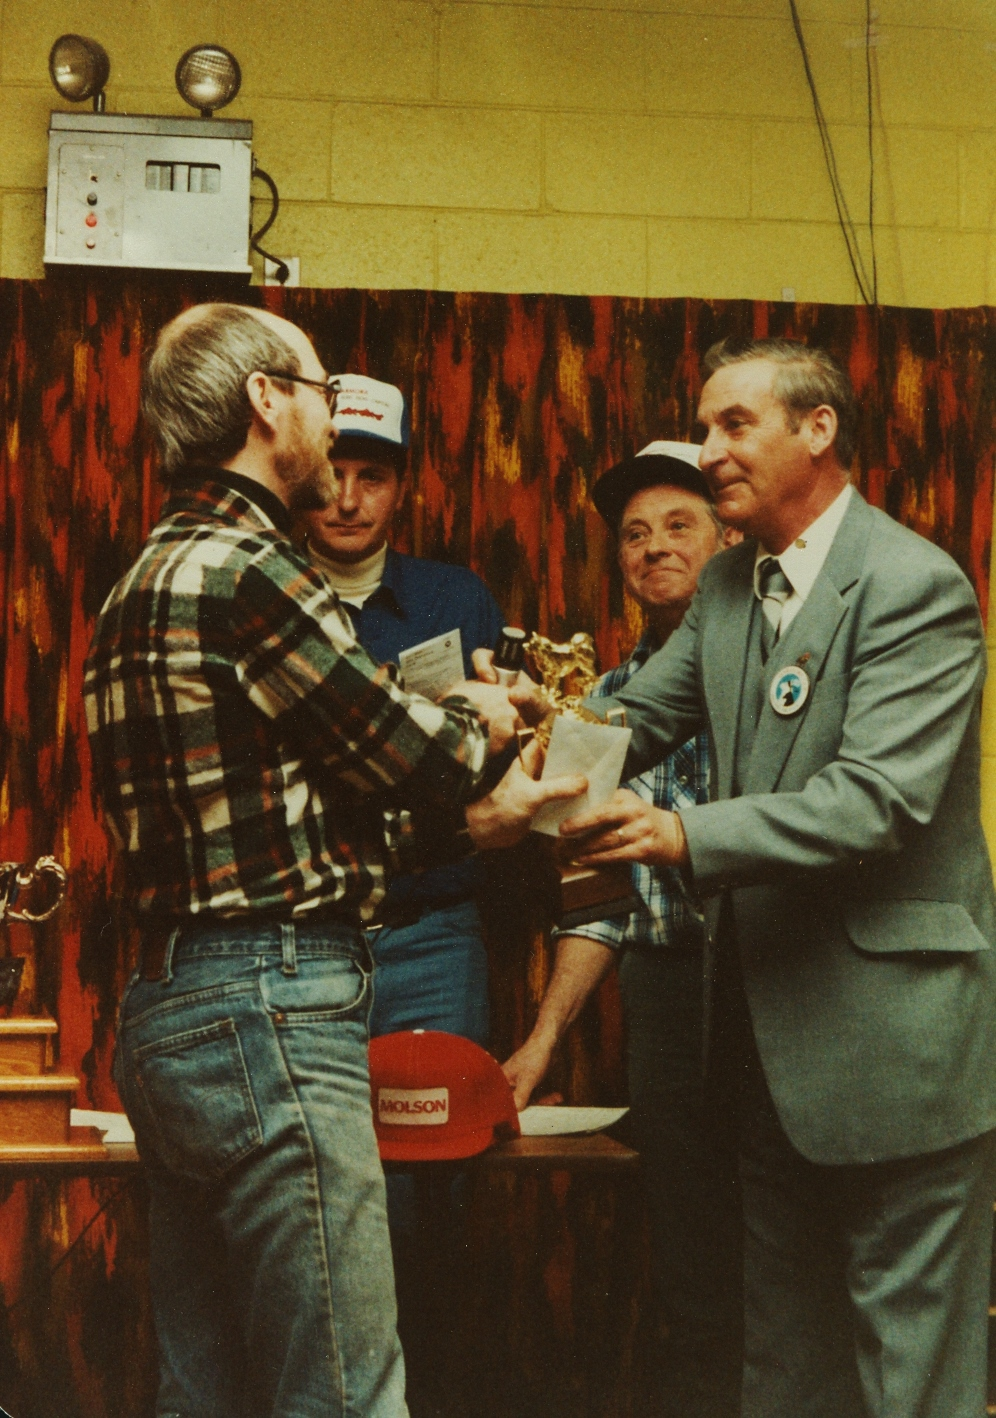 Snofest 1984